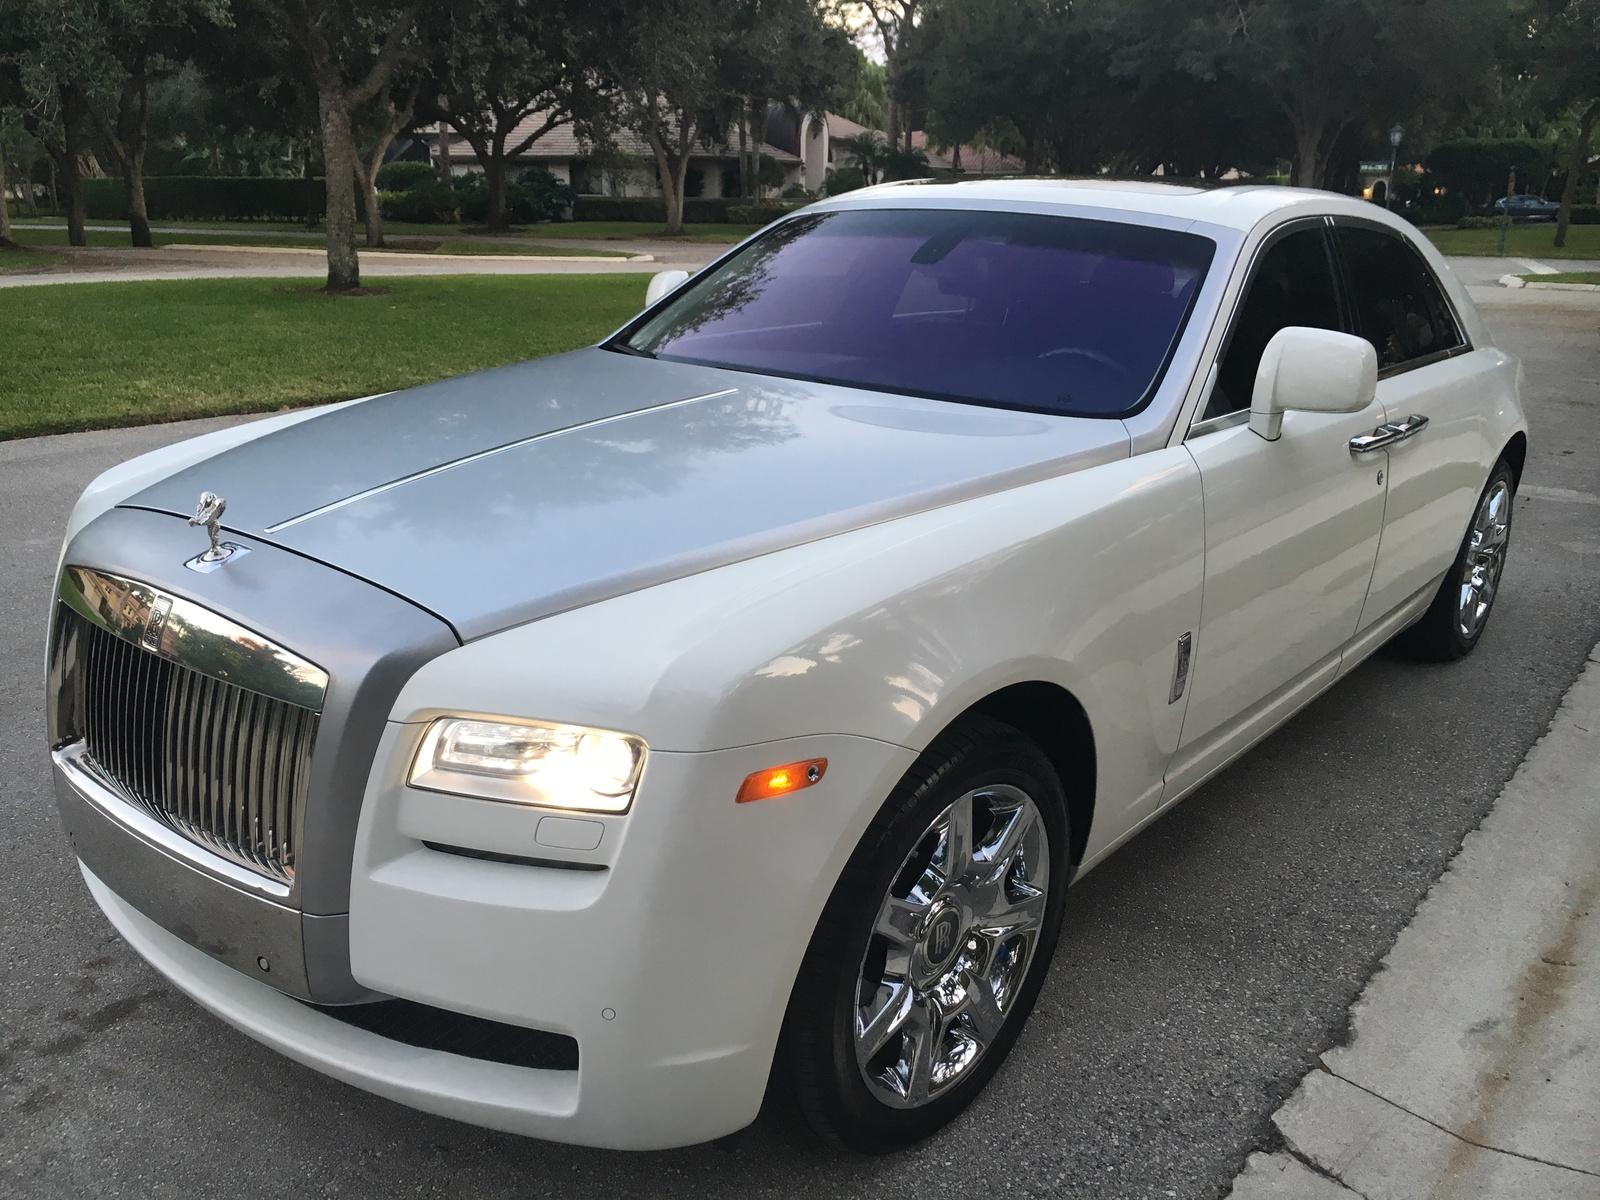 2011 Rolls-Royce Ghost - Overview - CarGurus